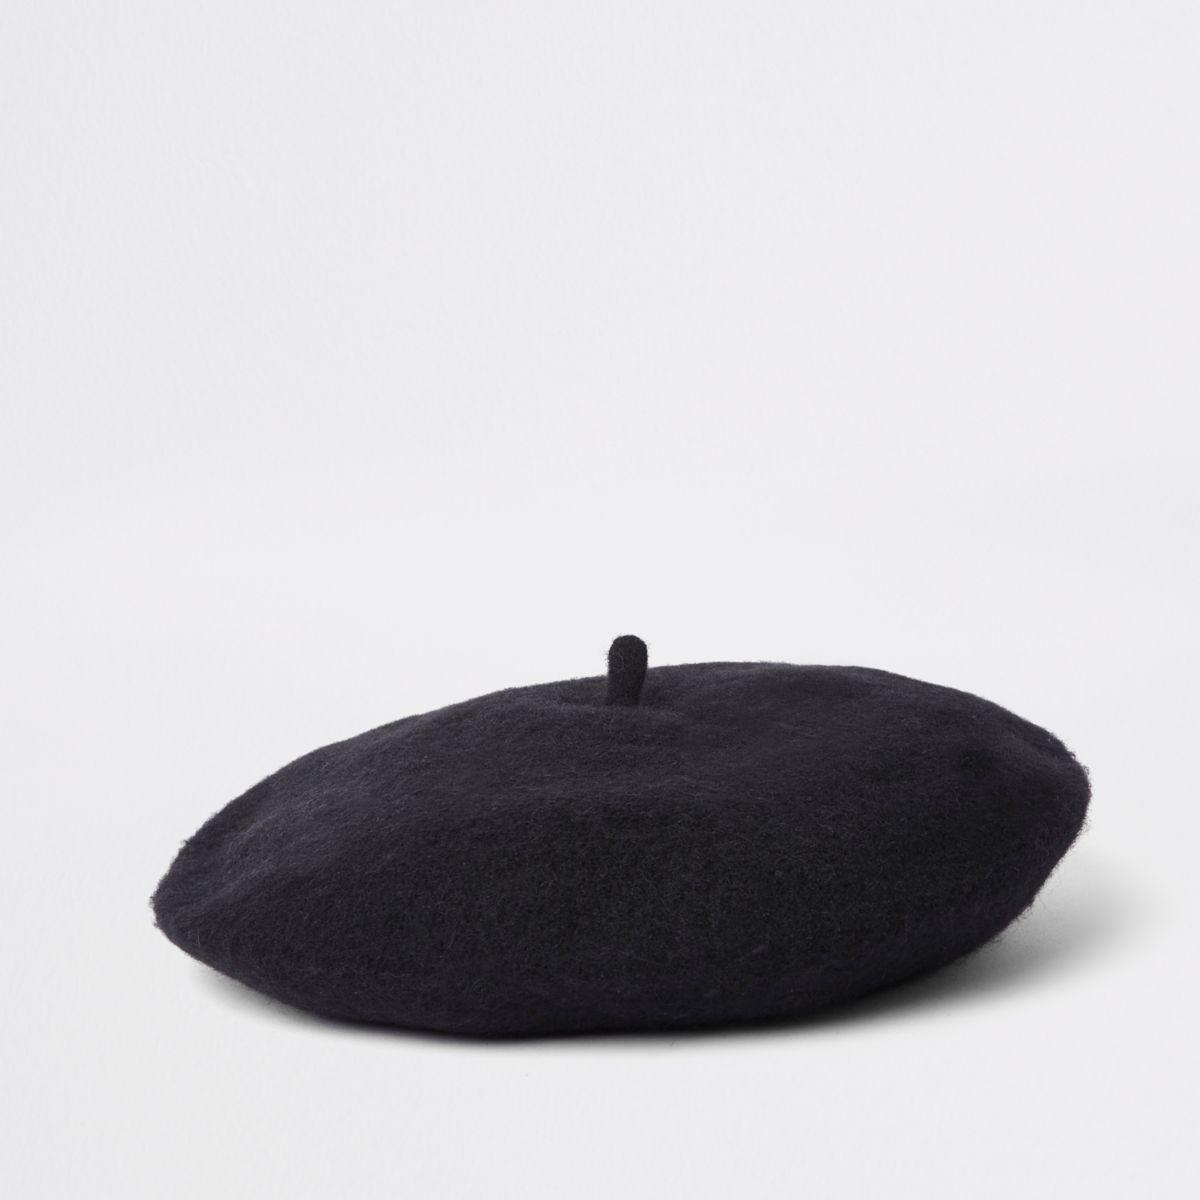 Black beret hat